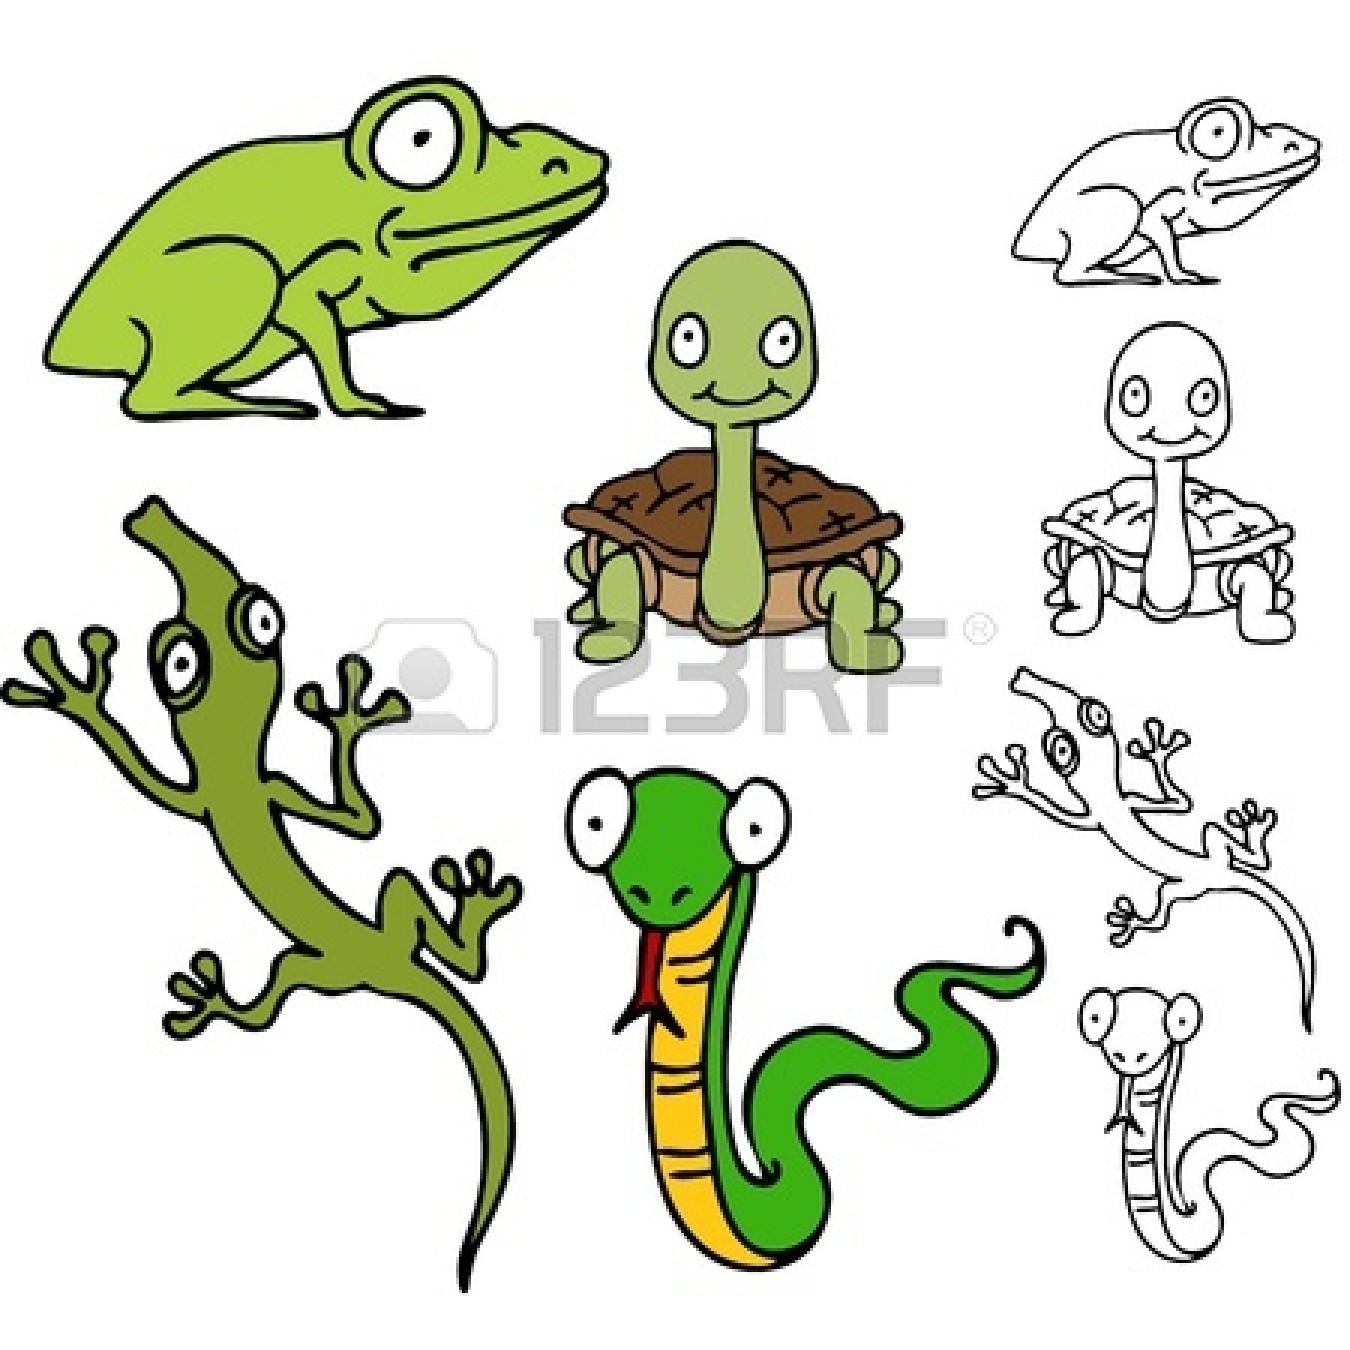 snake clip art : An image of a | Clipart Panda - Free ... Cute Reptiles Clipart